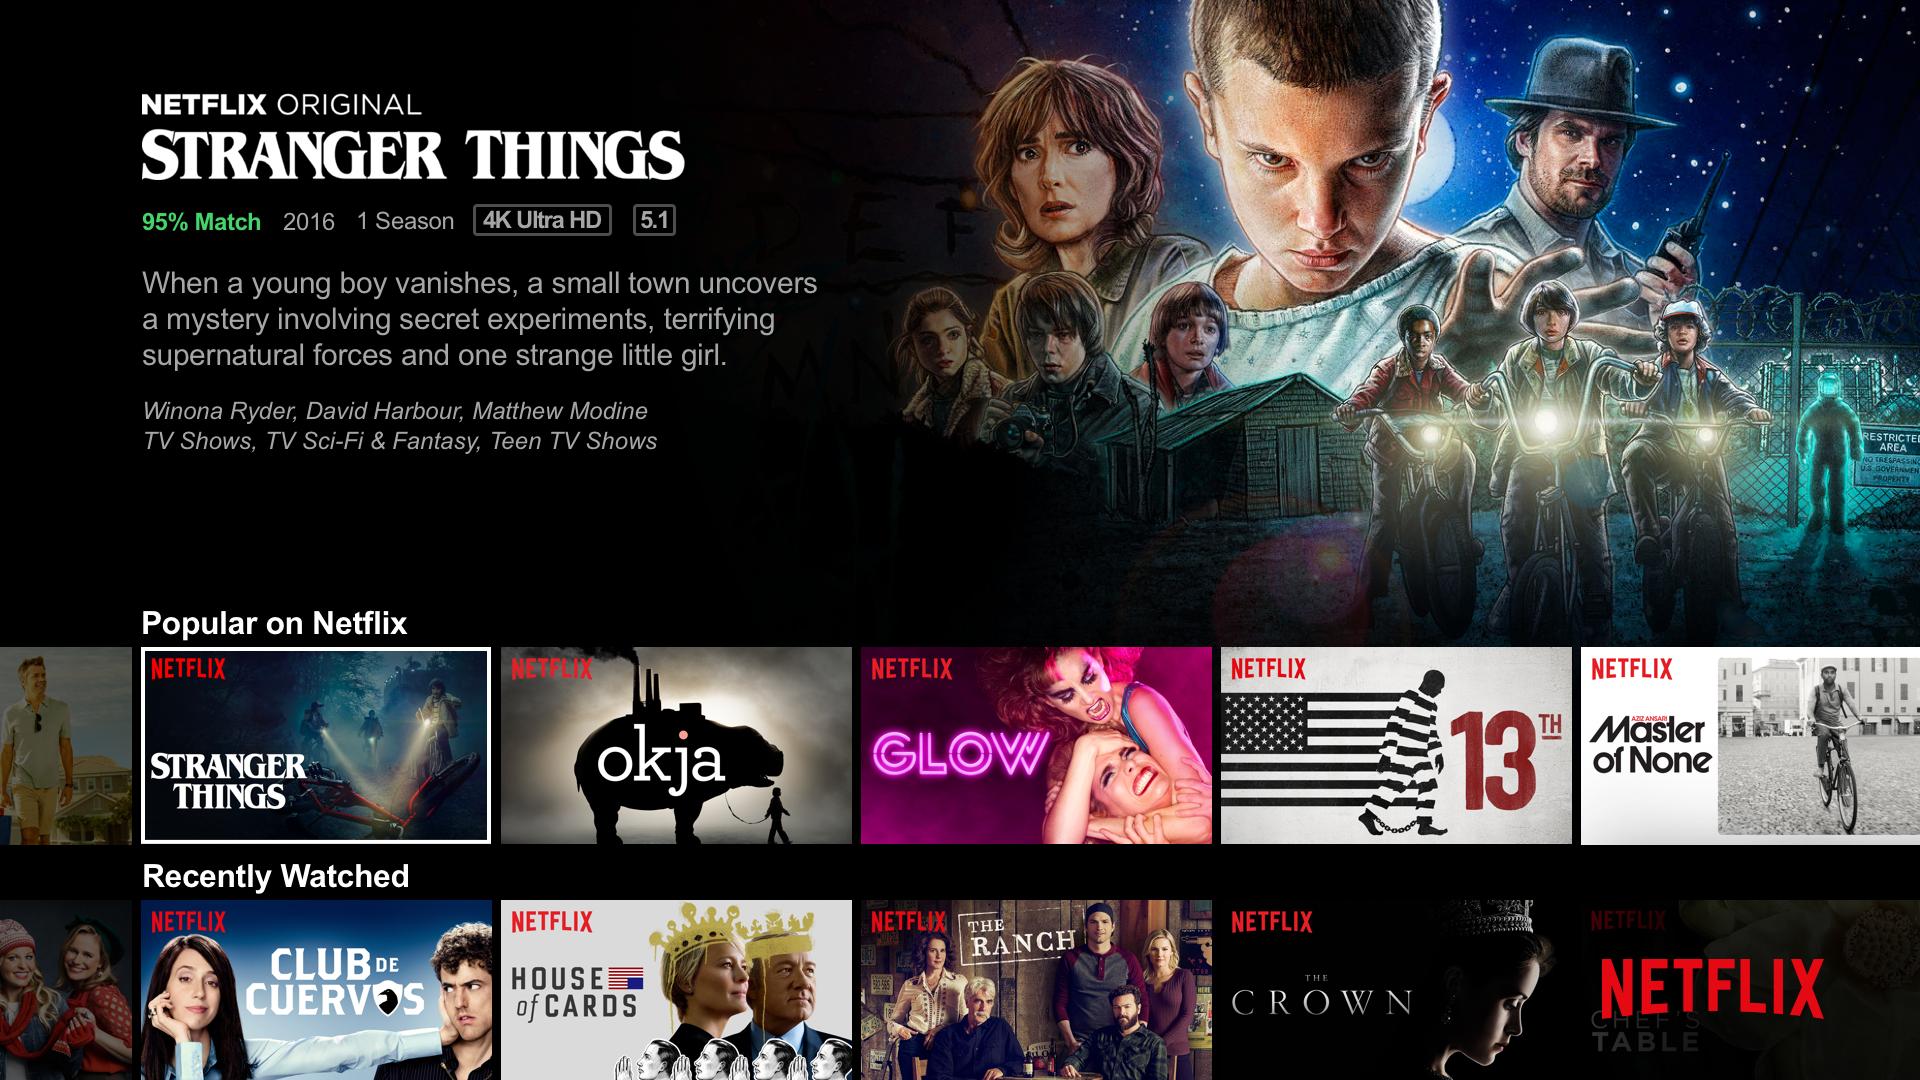 A screenshot of the Netflix home screen featuring their original TV show, Stranger Things.